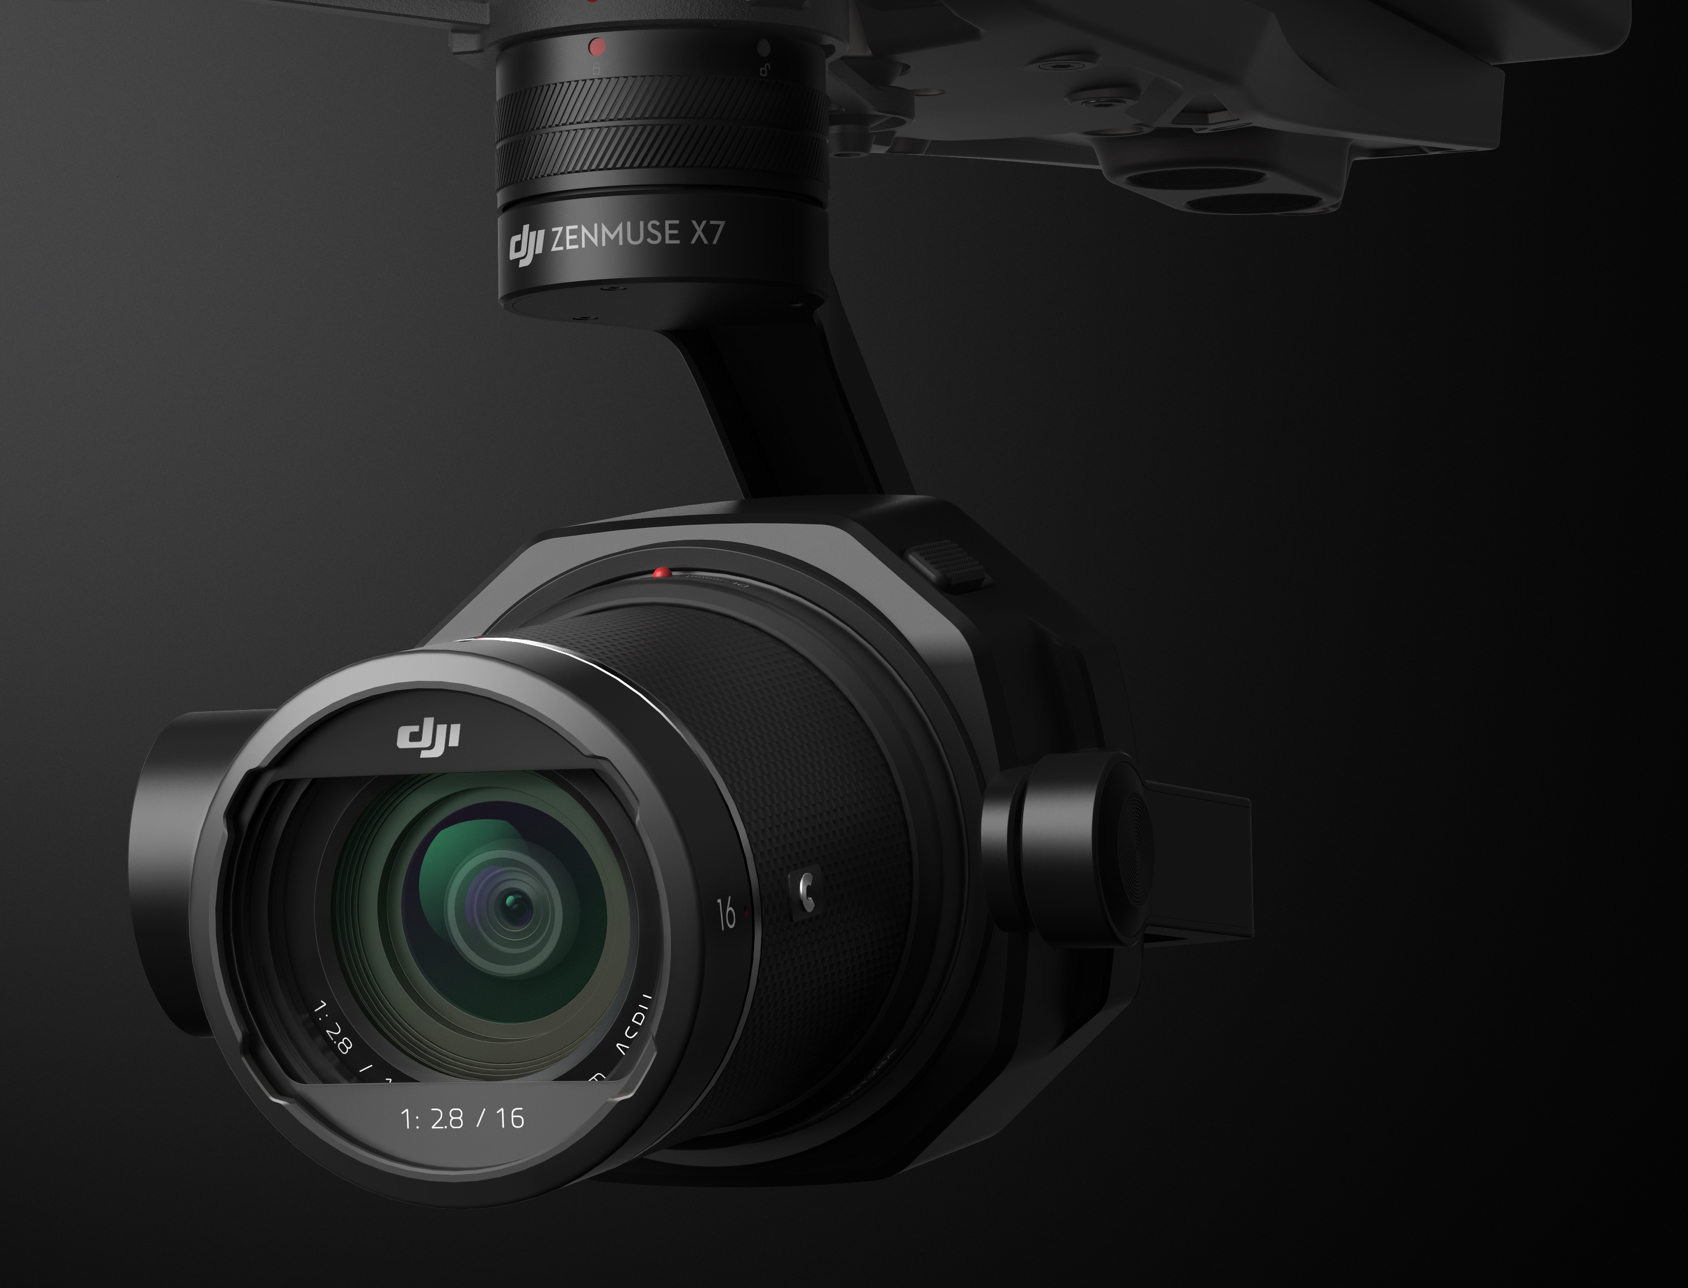 DJI Zenmuse X7 - S35 Gimbal 6K RAW Cinema Camera for 3.000 Euro